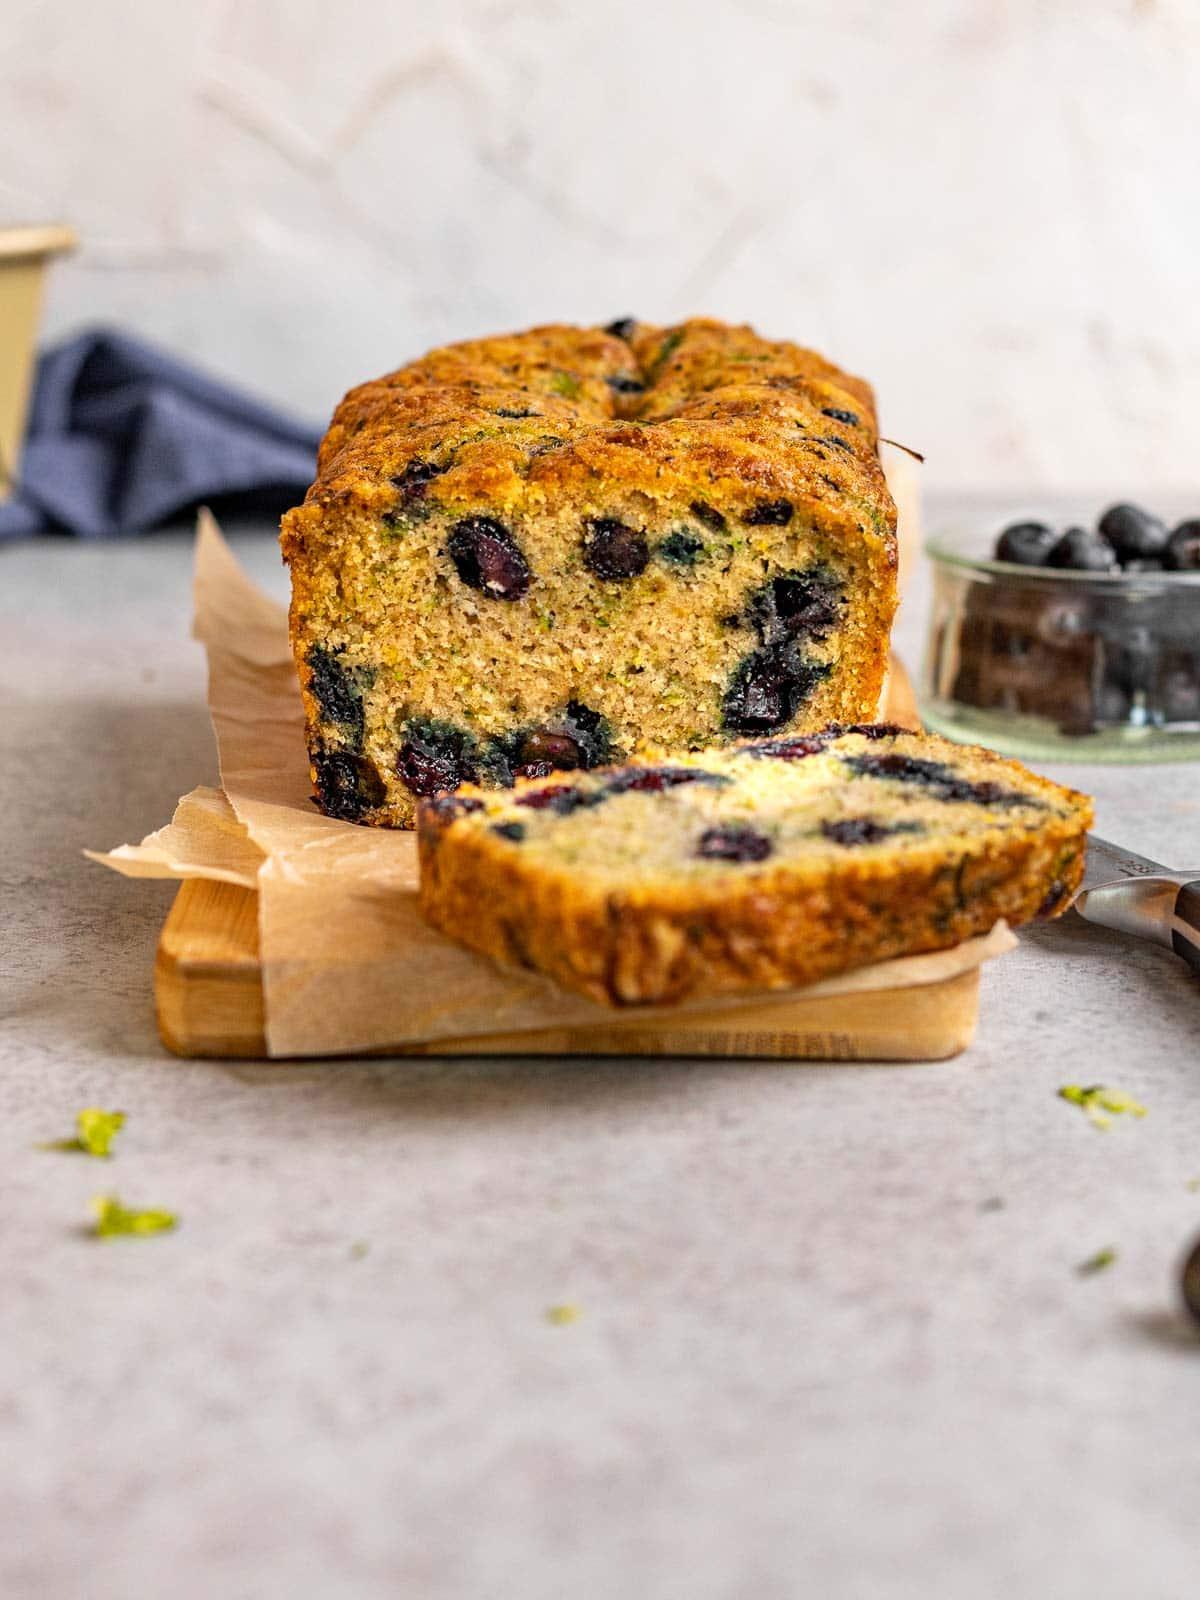 Blueberry Zucchini Bread loaf sliced on cutting board